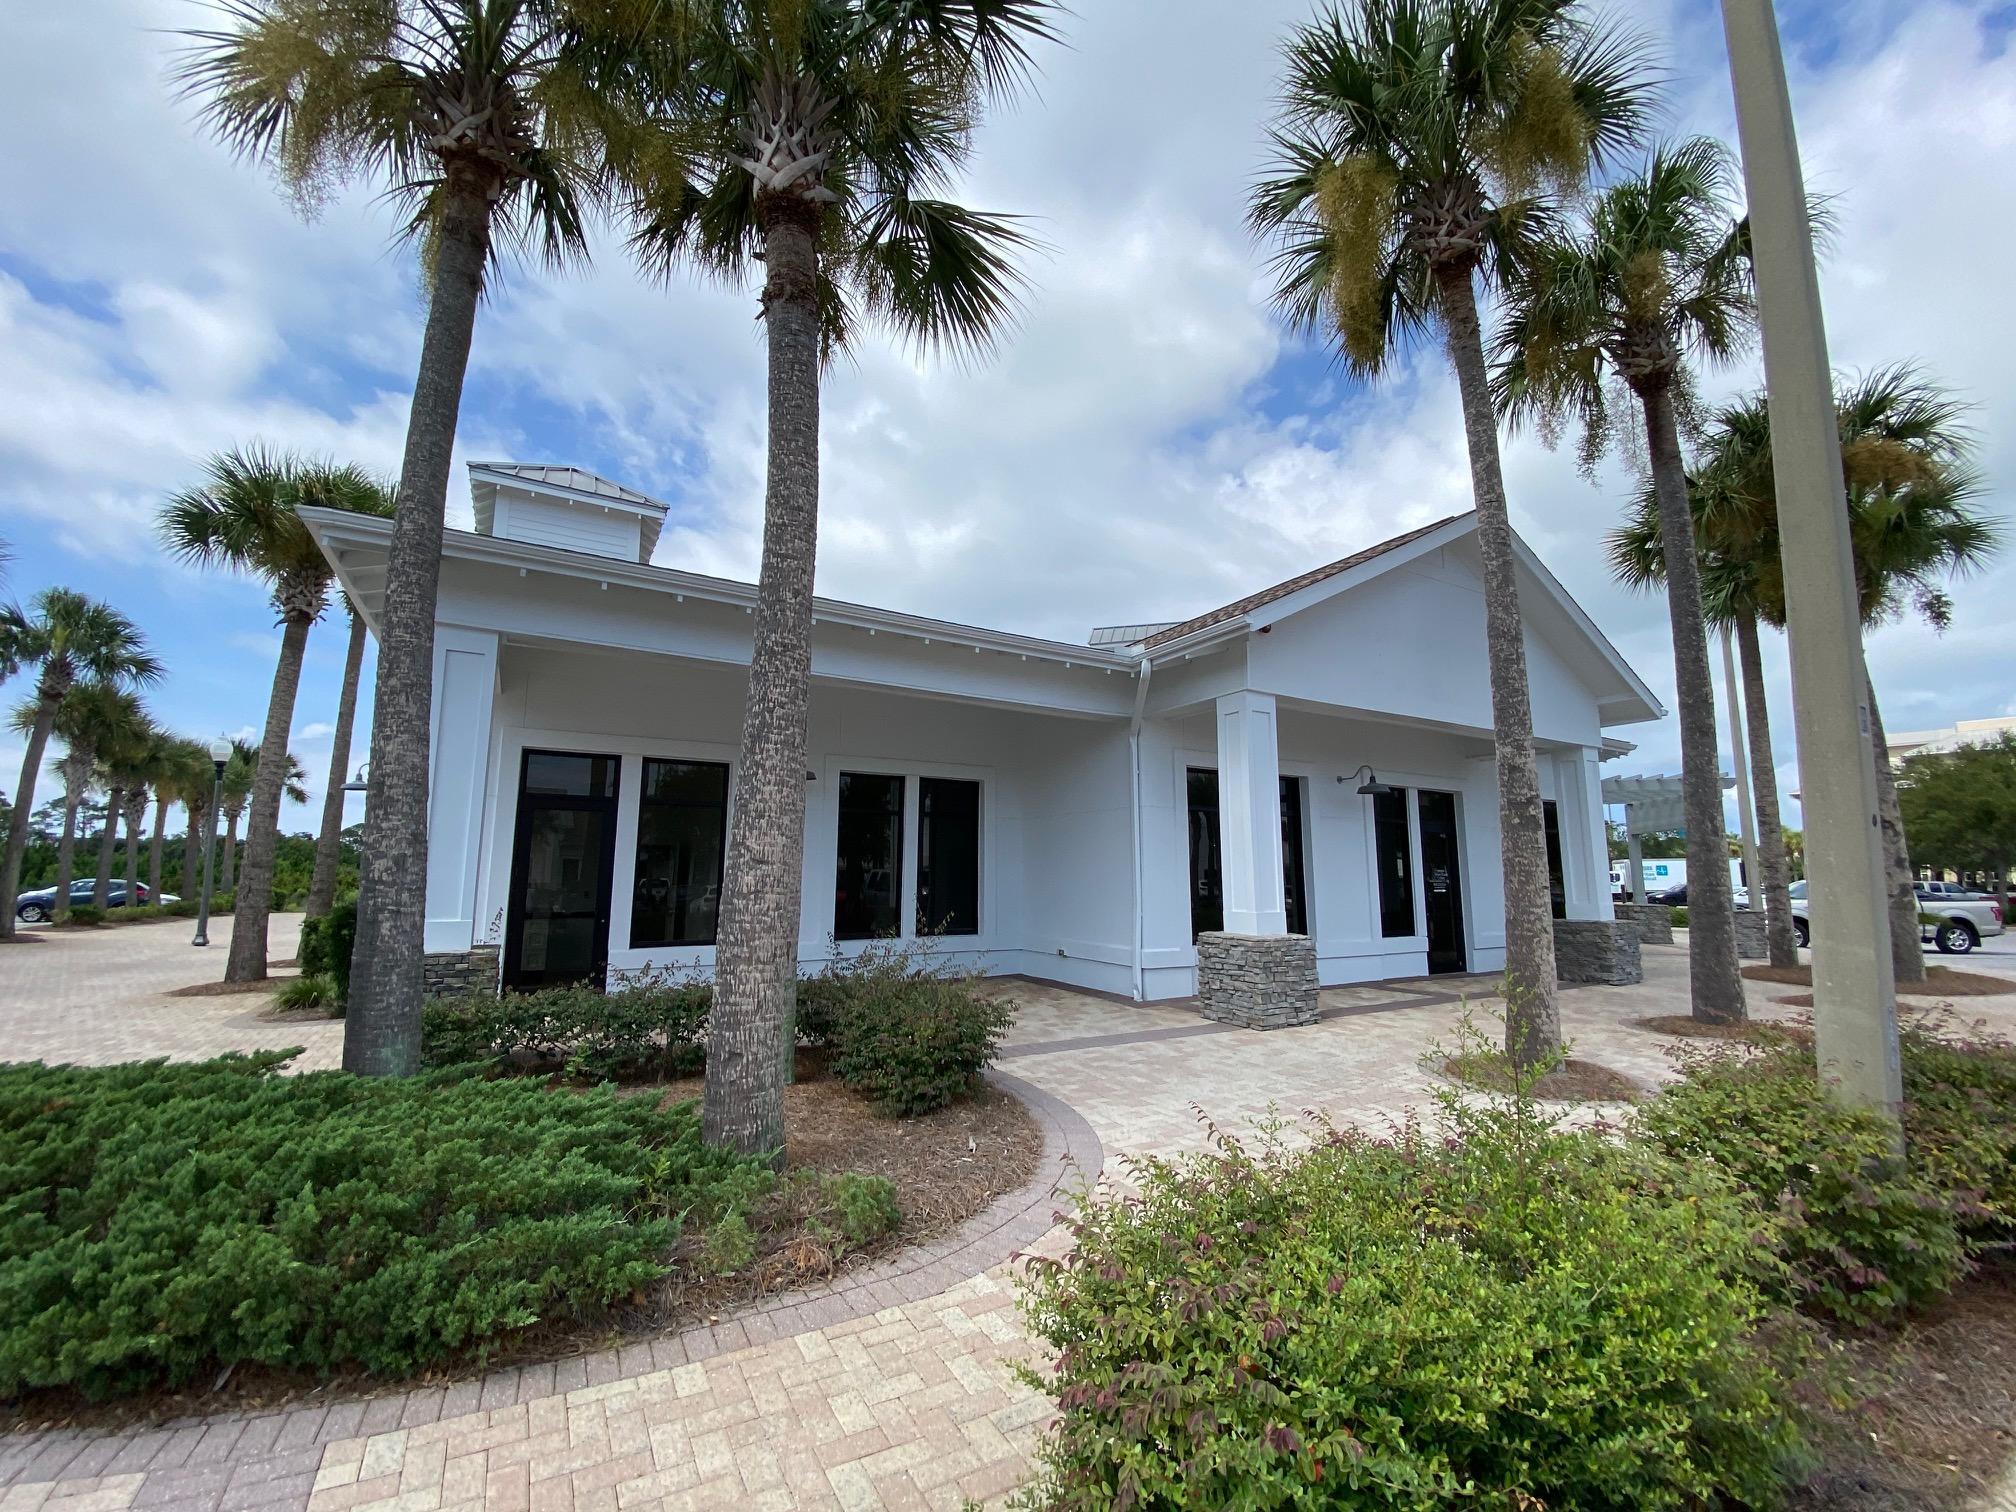 Photo of home for sale at 651 Grand Panama, Panama City Beach FL